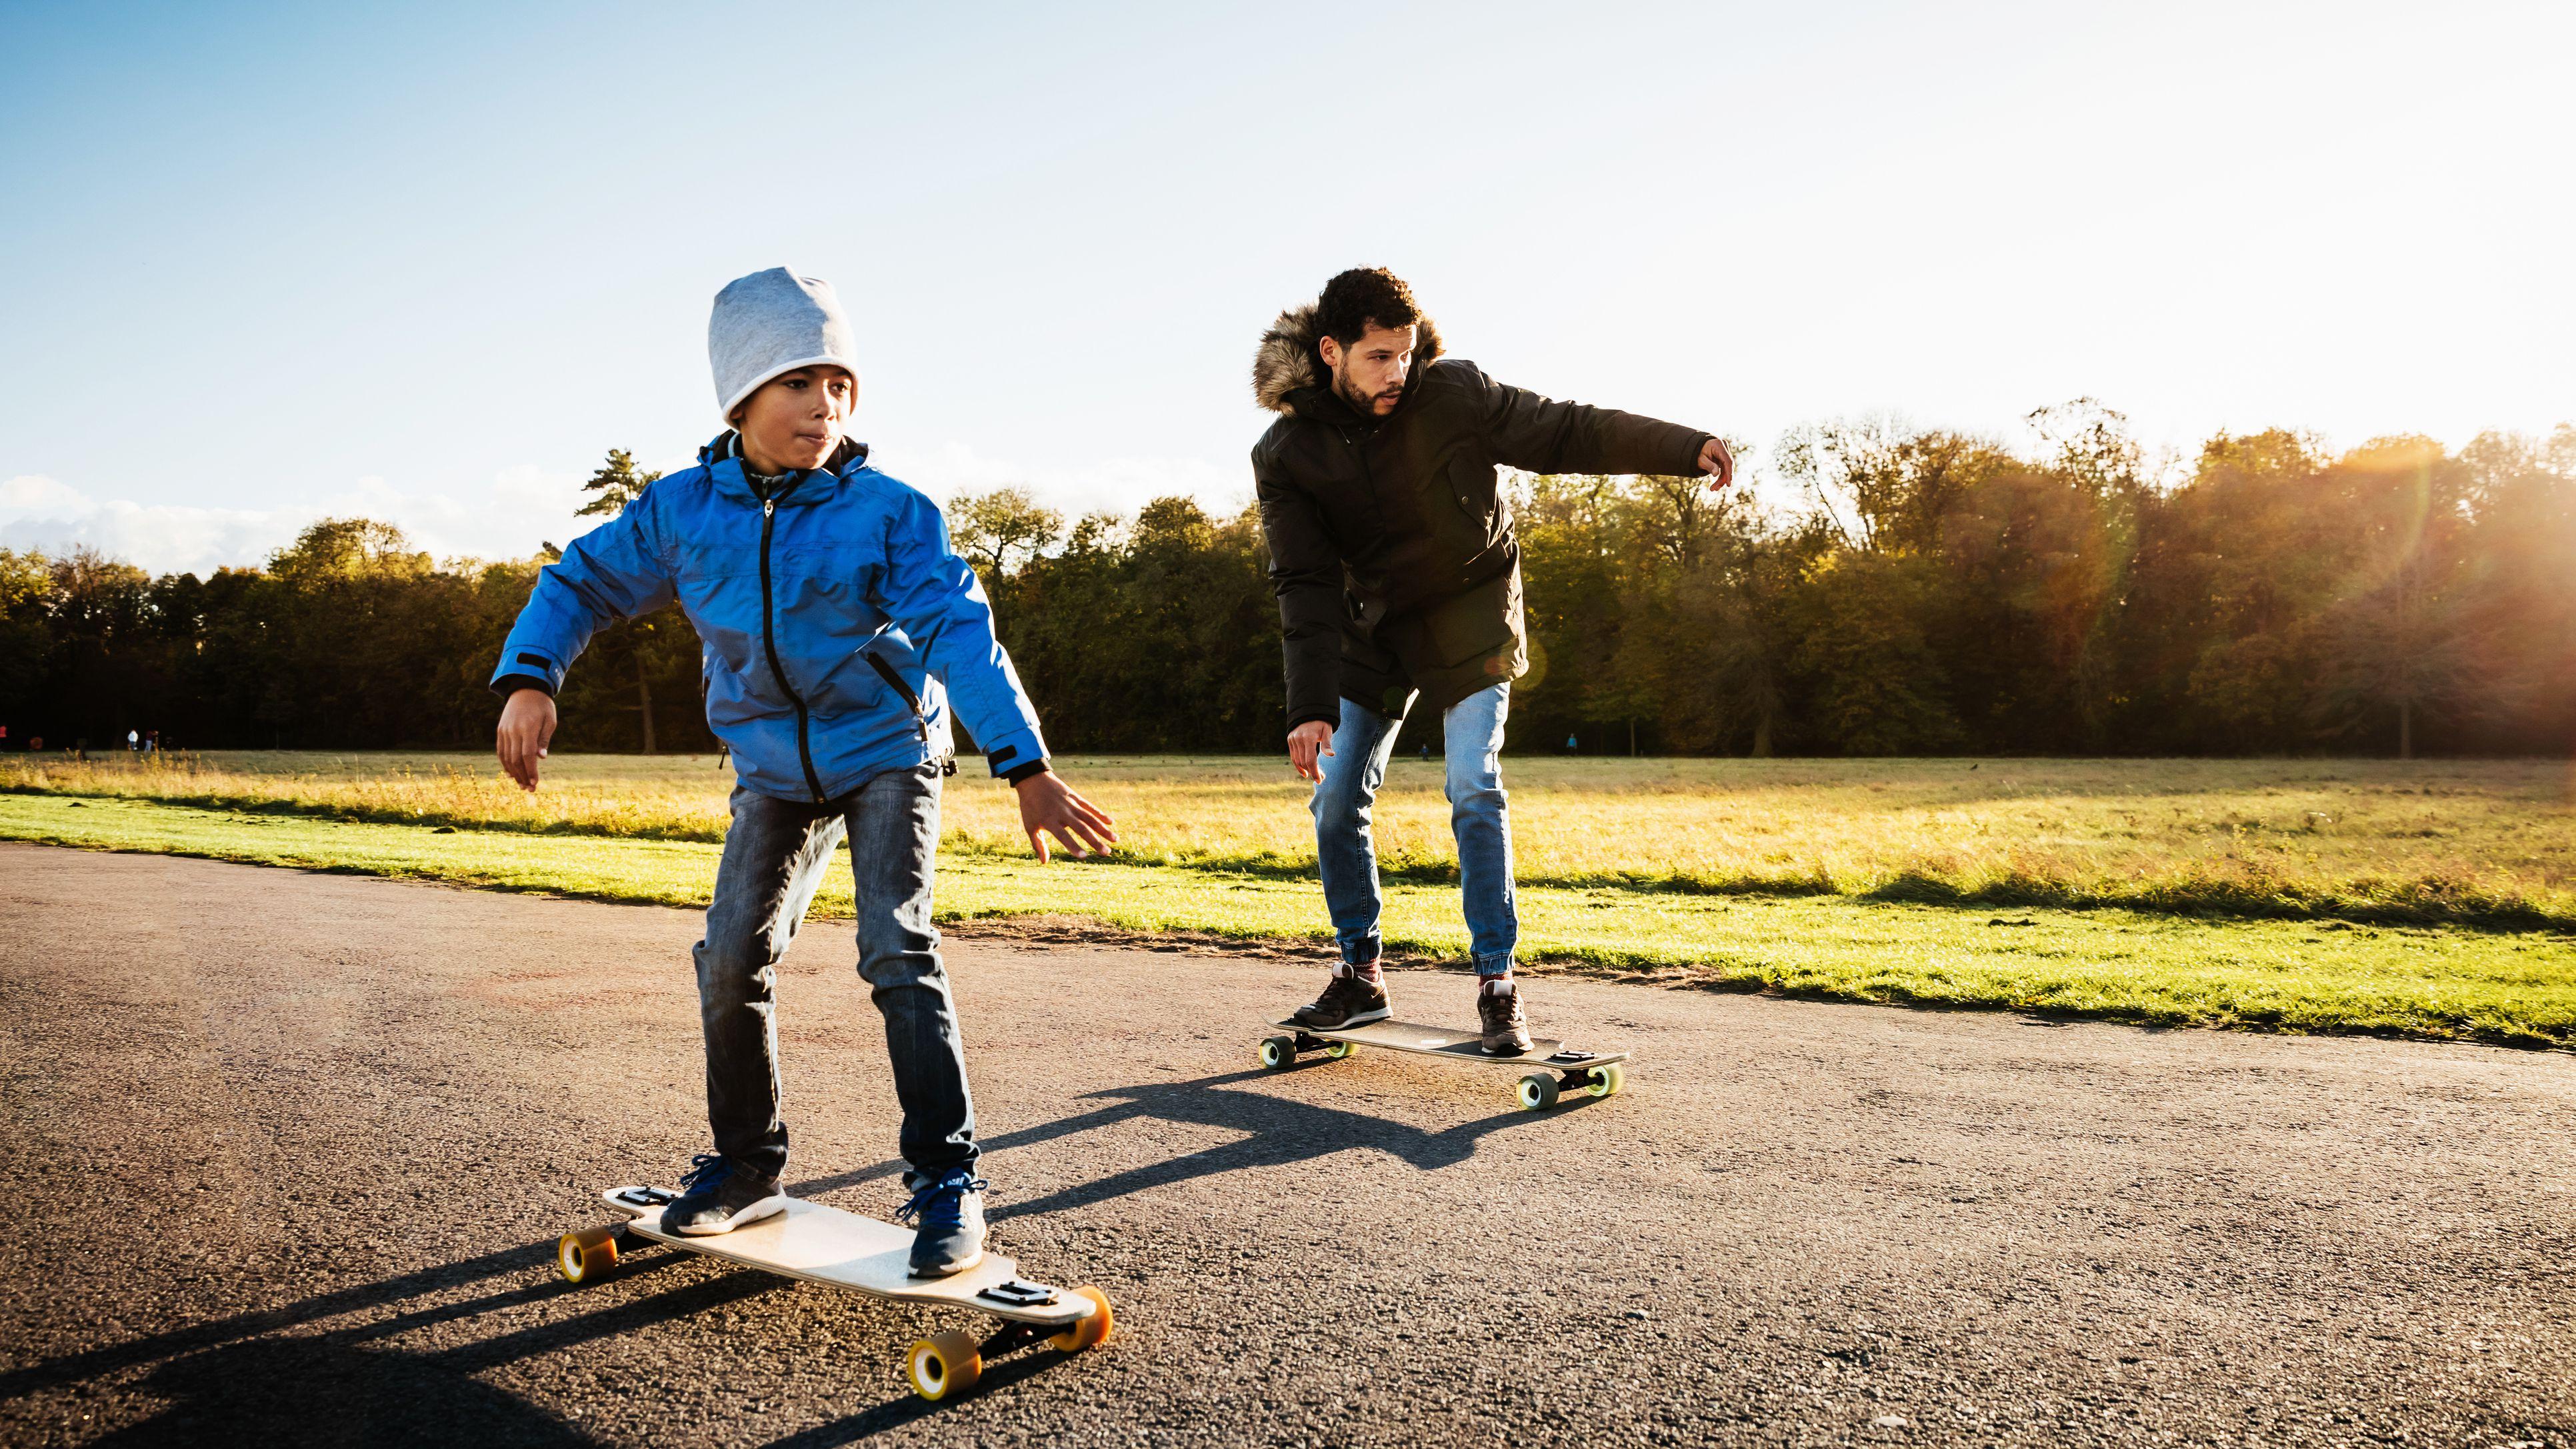 The 8 Best Skateboards of 2019